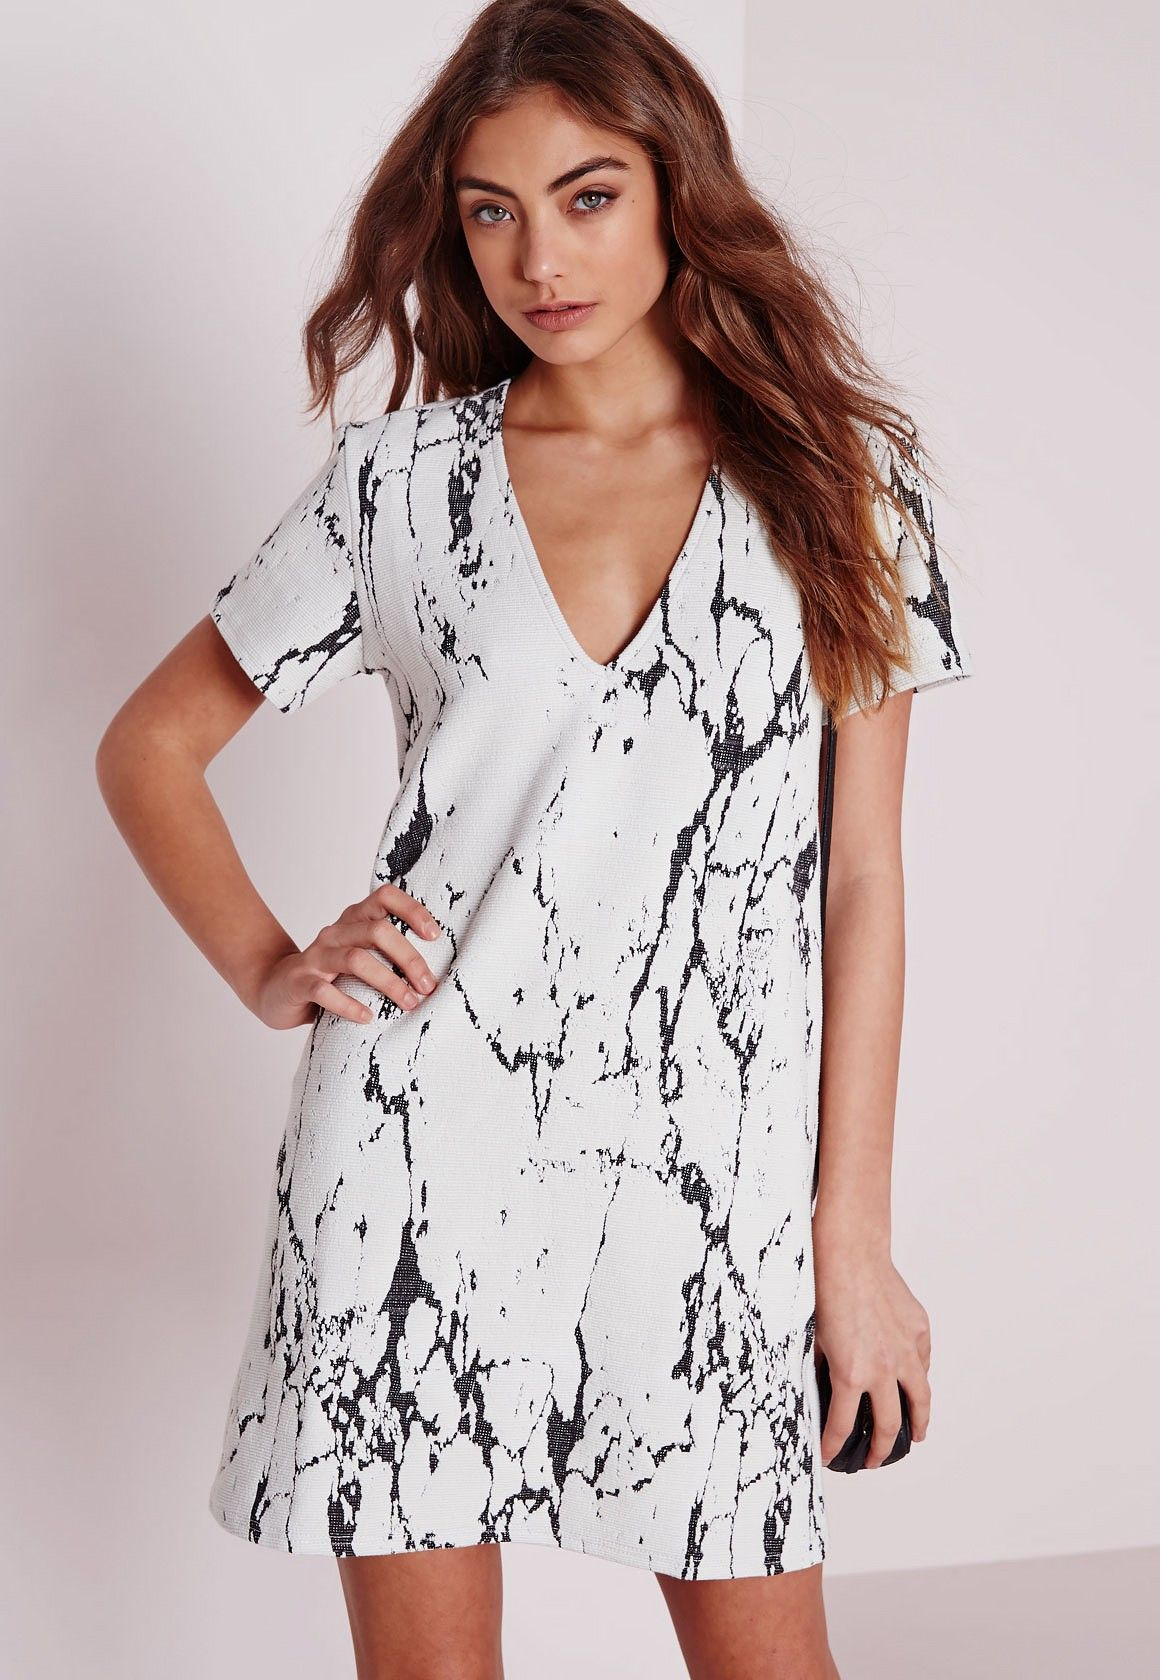 Plunge Short Sleeve Knitted Shift dress White Black Marble - Dresses - Mini  Dresses - ef3d4afe315